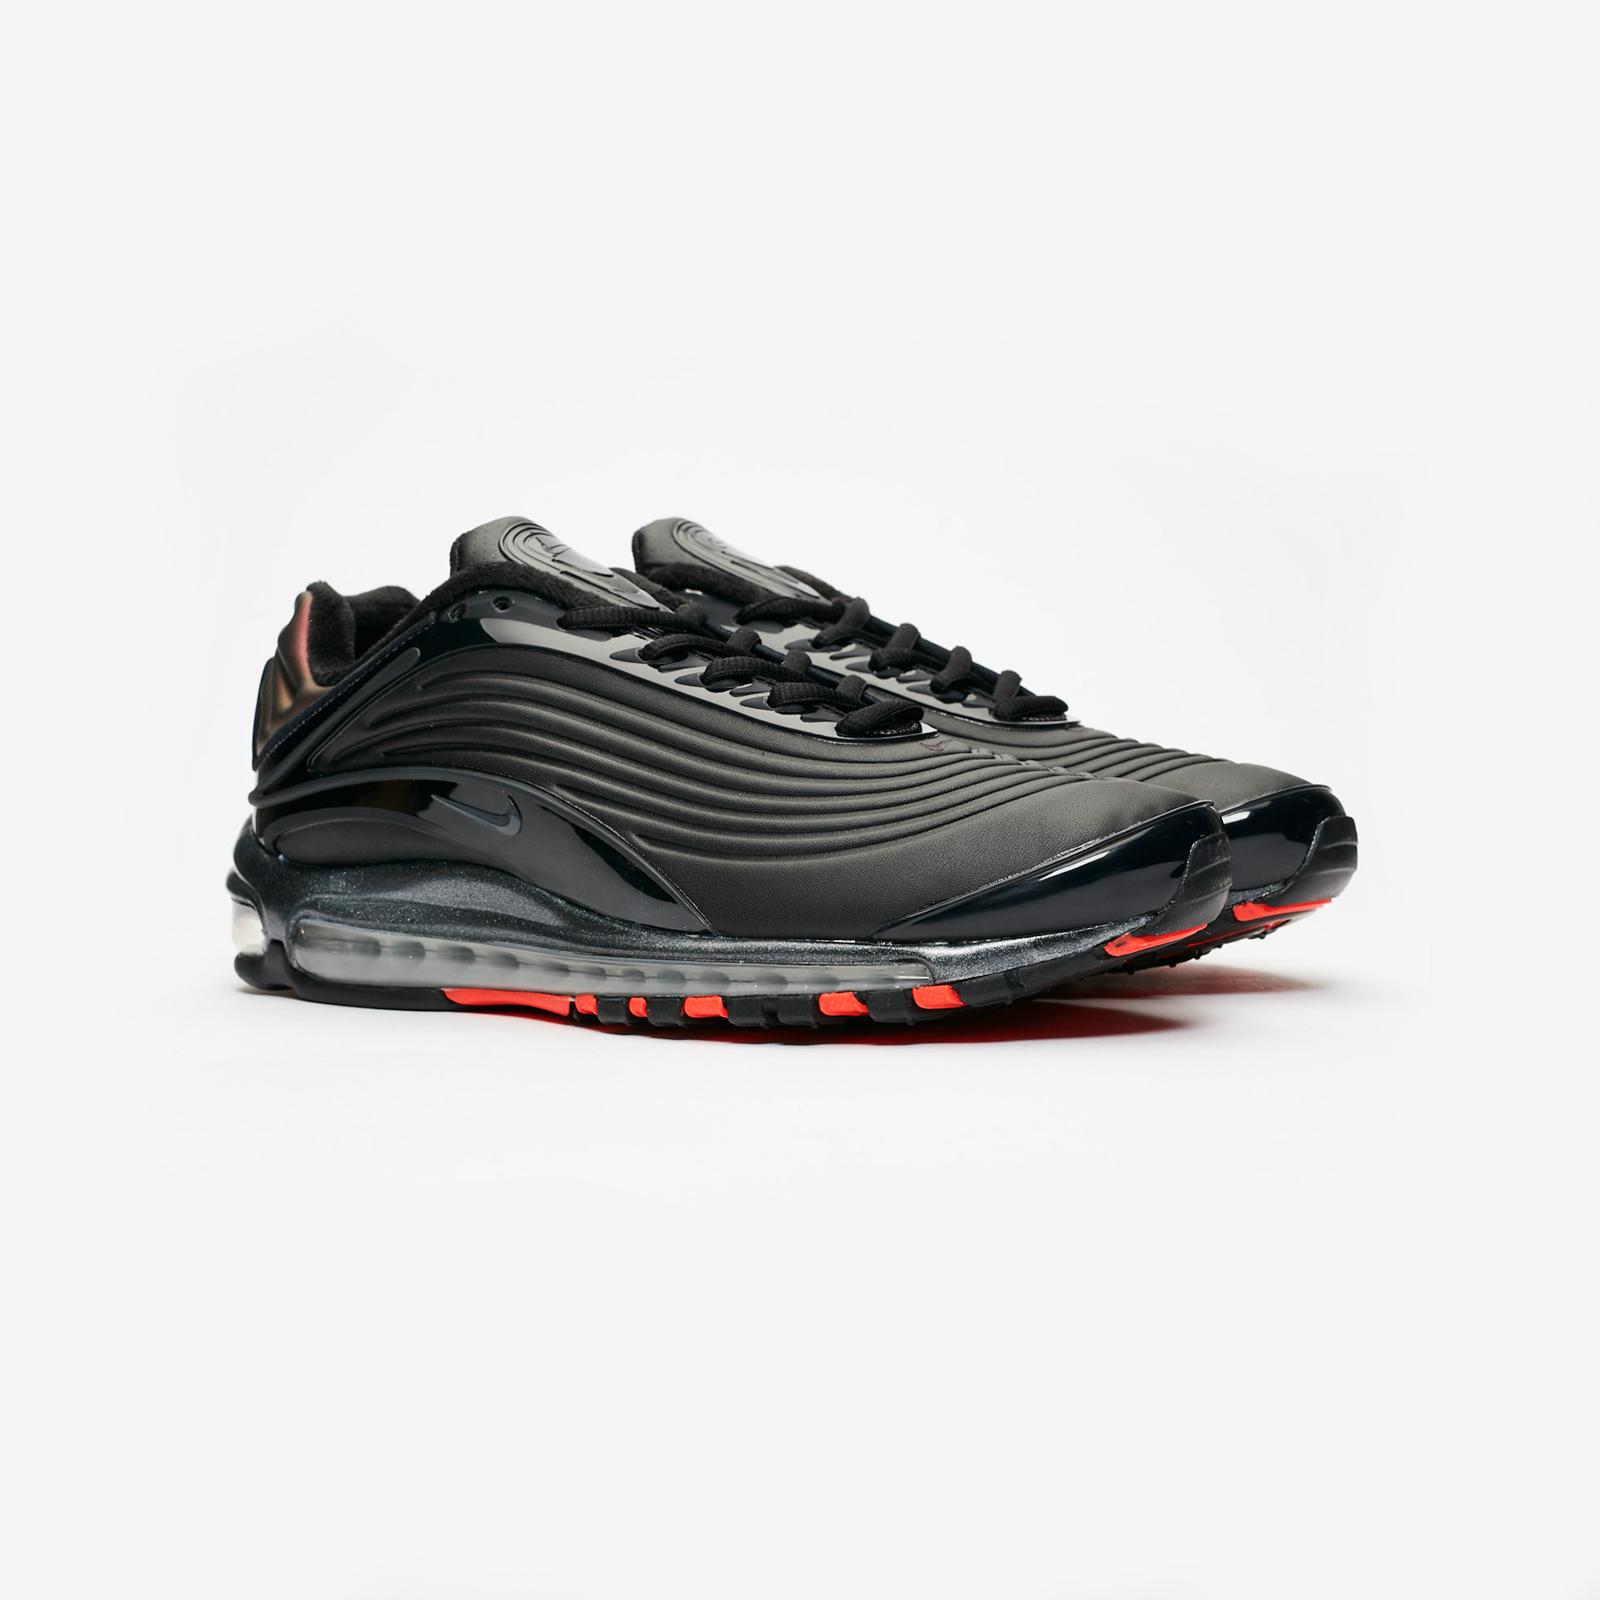 Nike Air Max Deluxe SE - Ao8284-001 - Sneakersnstuff  3ca7fd997